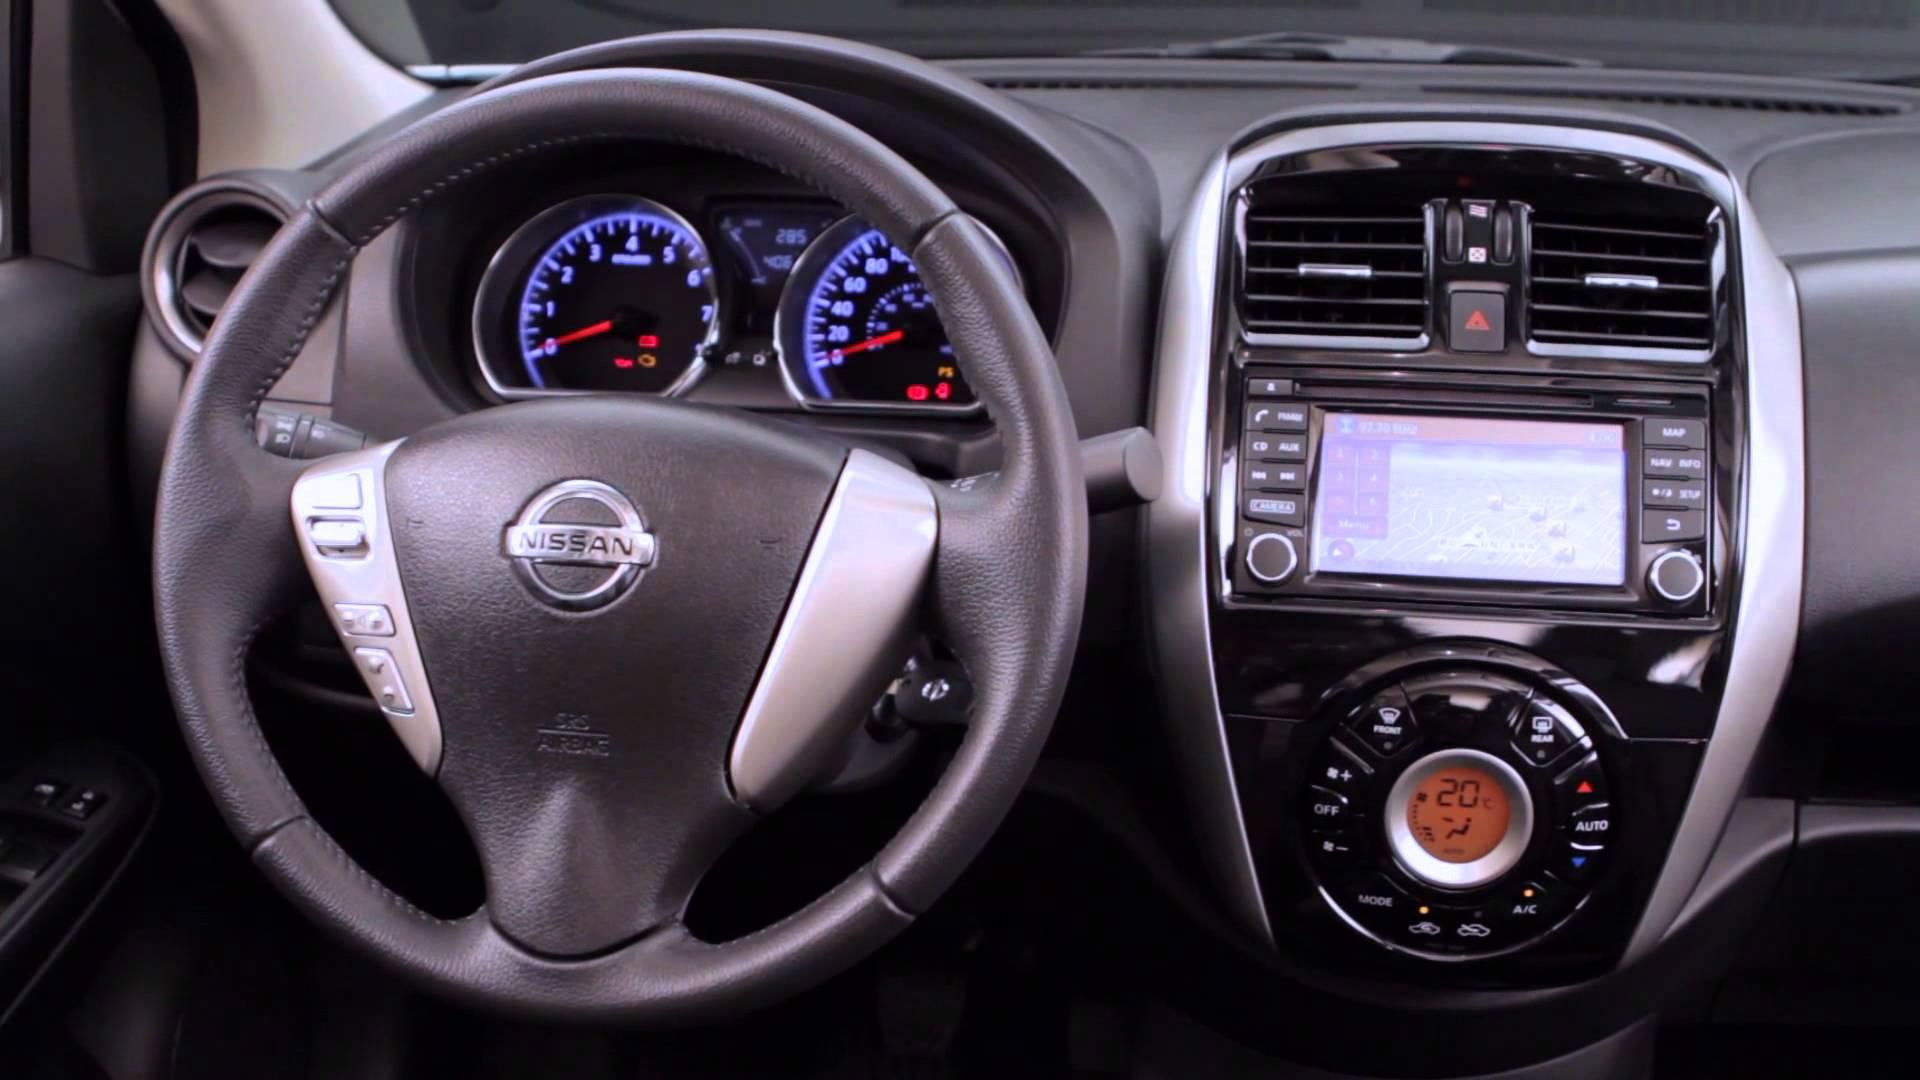 2016 Nissan Versa Photo 2